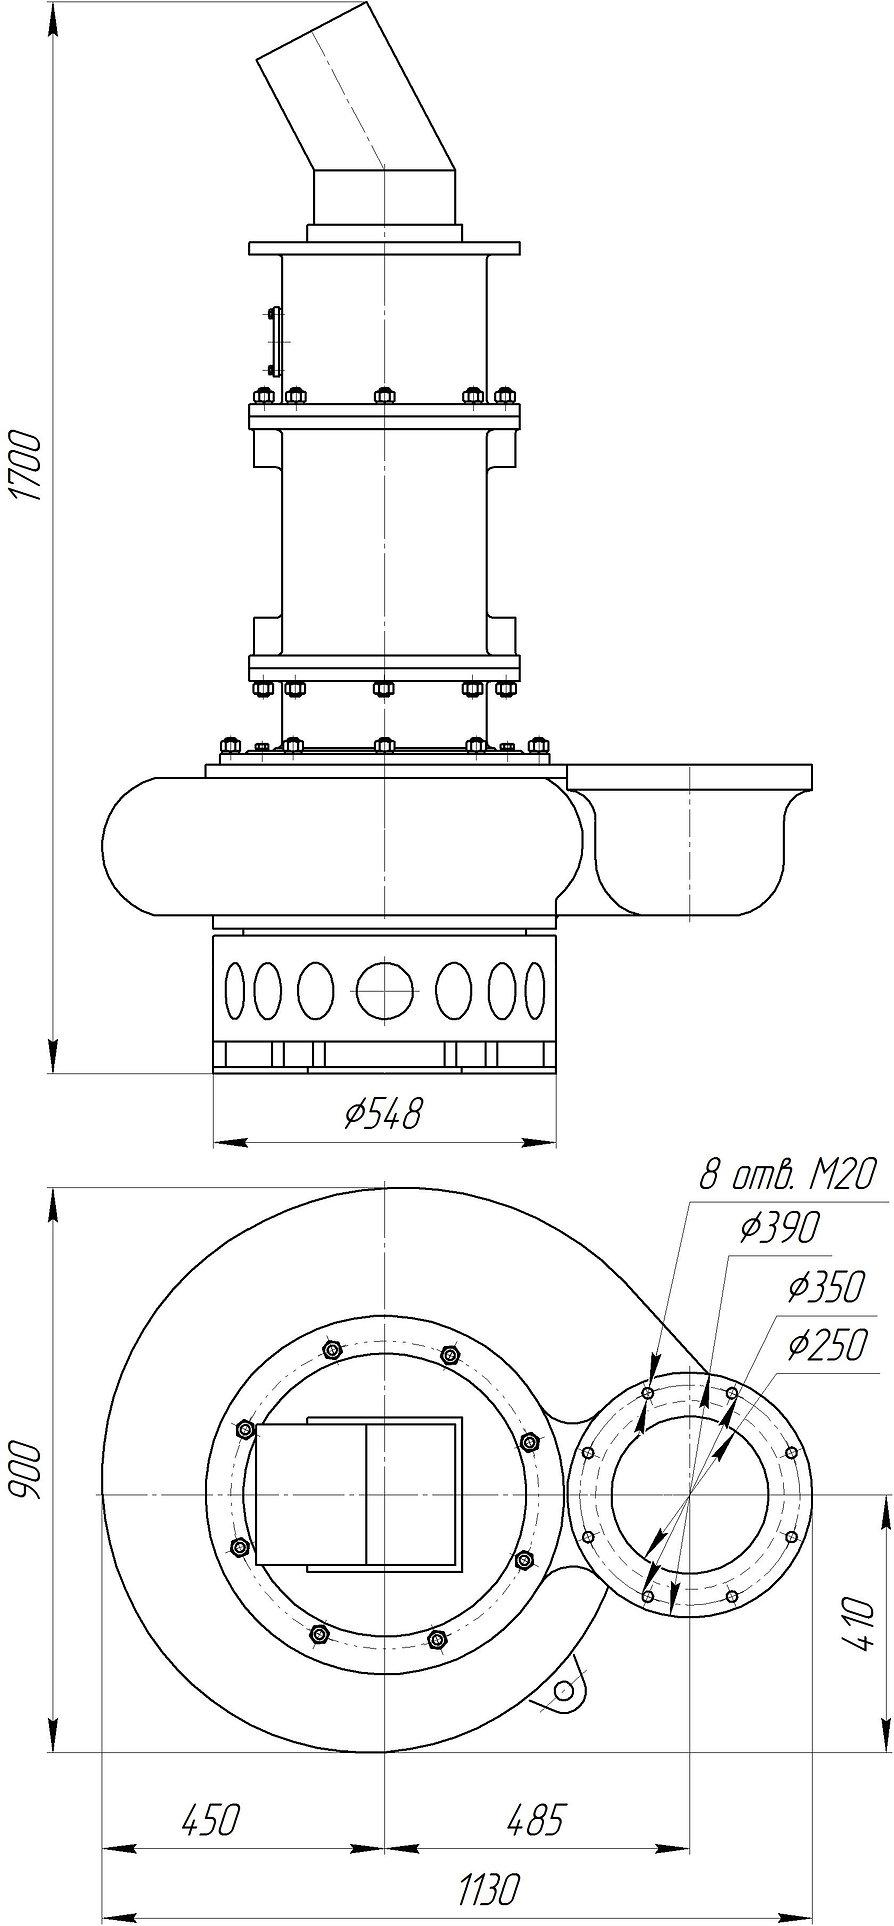 Габаритный чертеж насоса DARGFOW HY85HC.